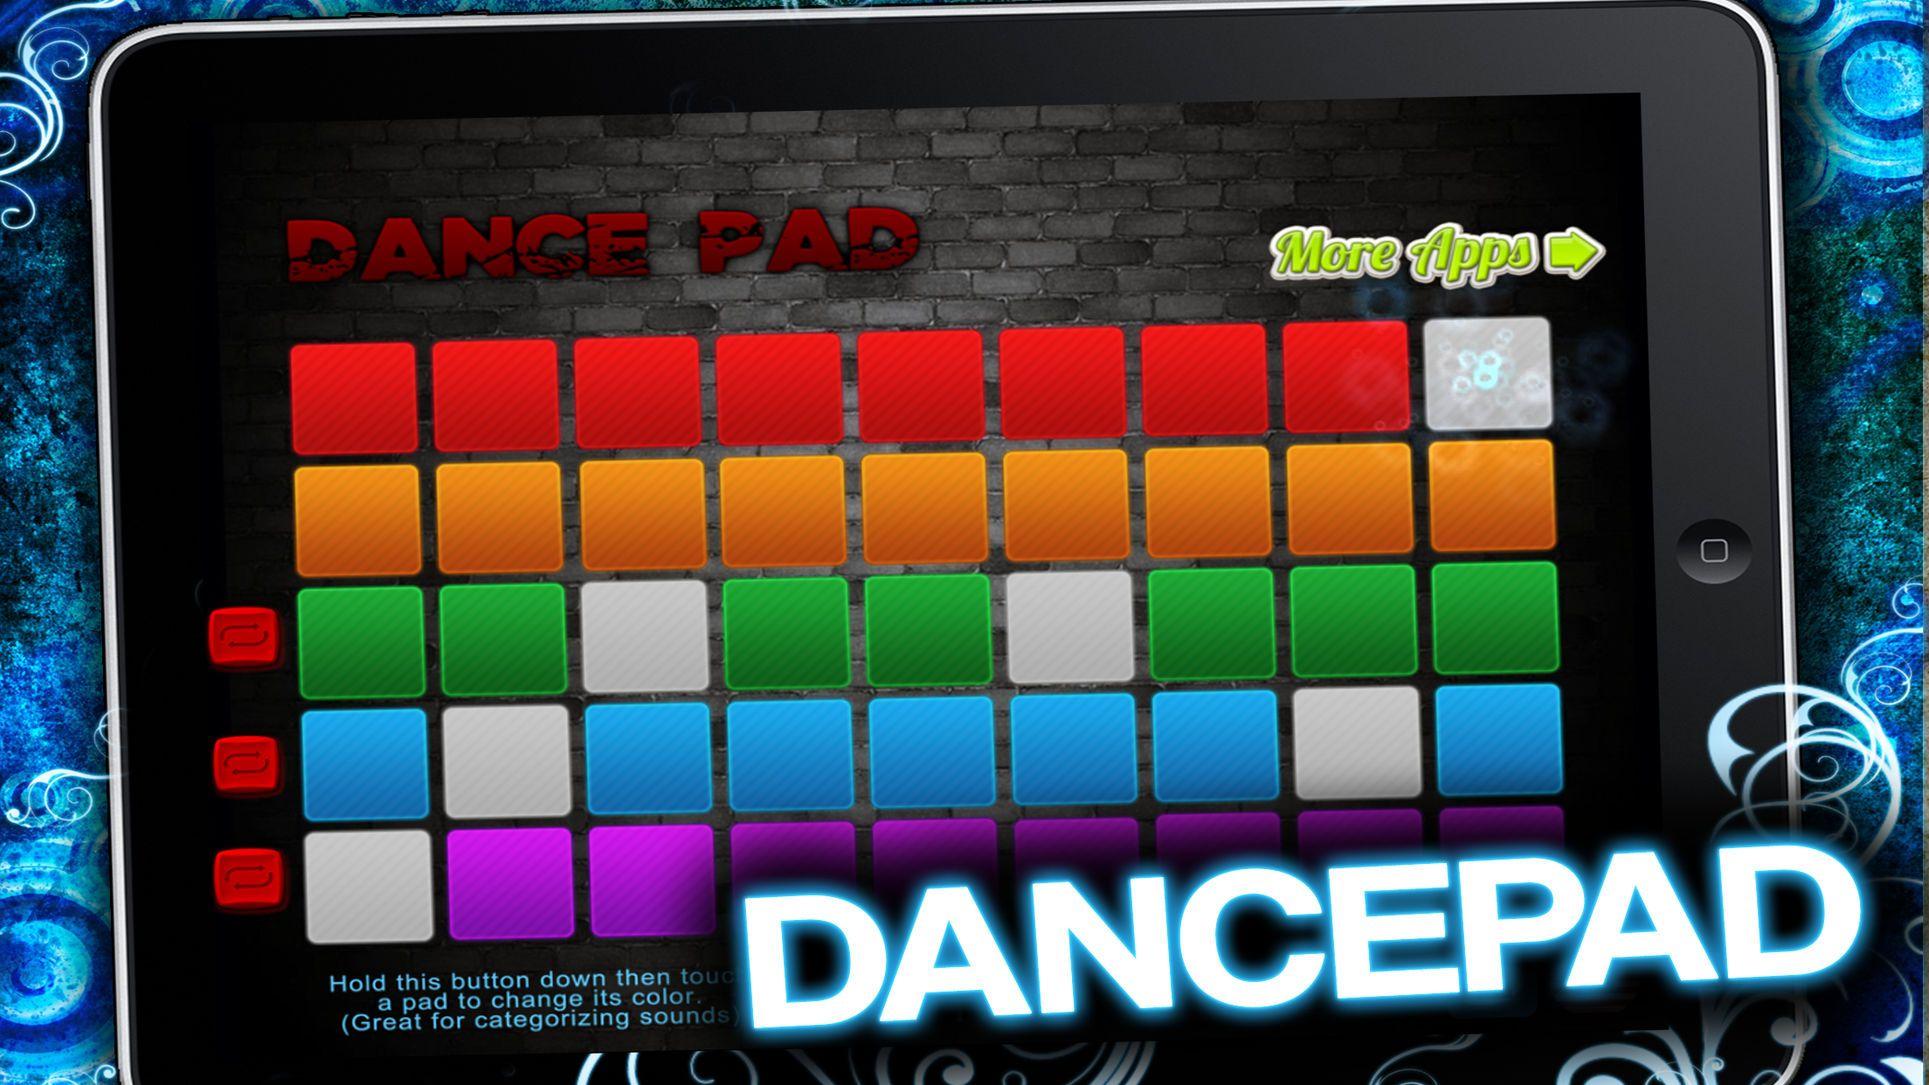 DancePad Hottest Music Maker for Hip Hop and EDM FAD